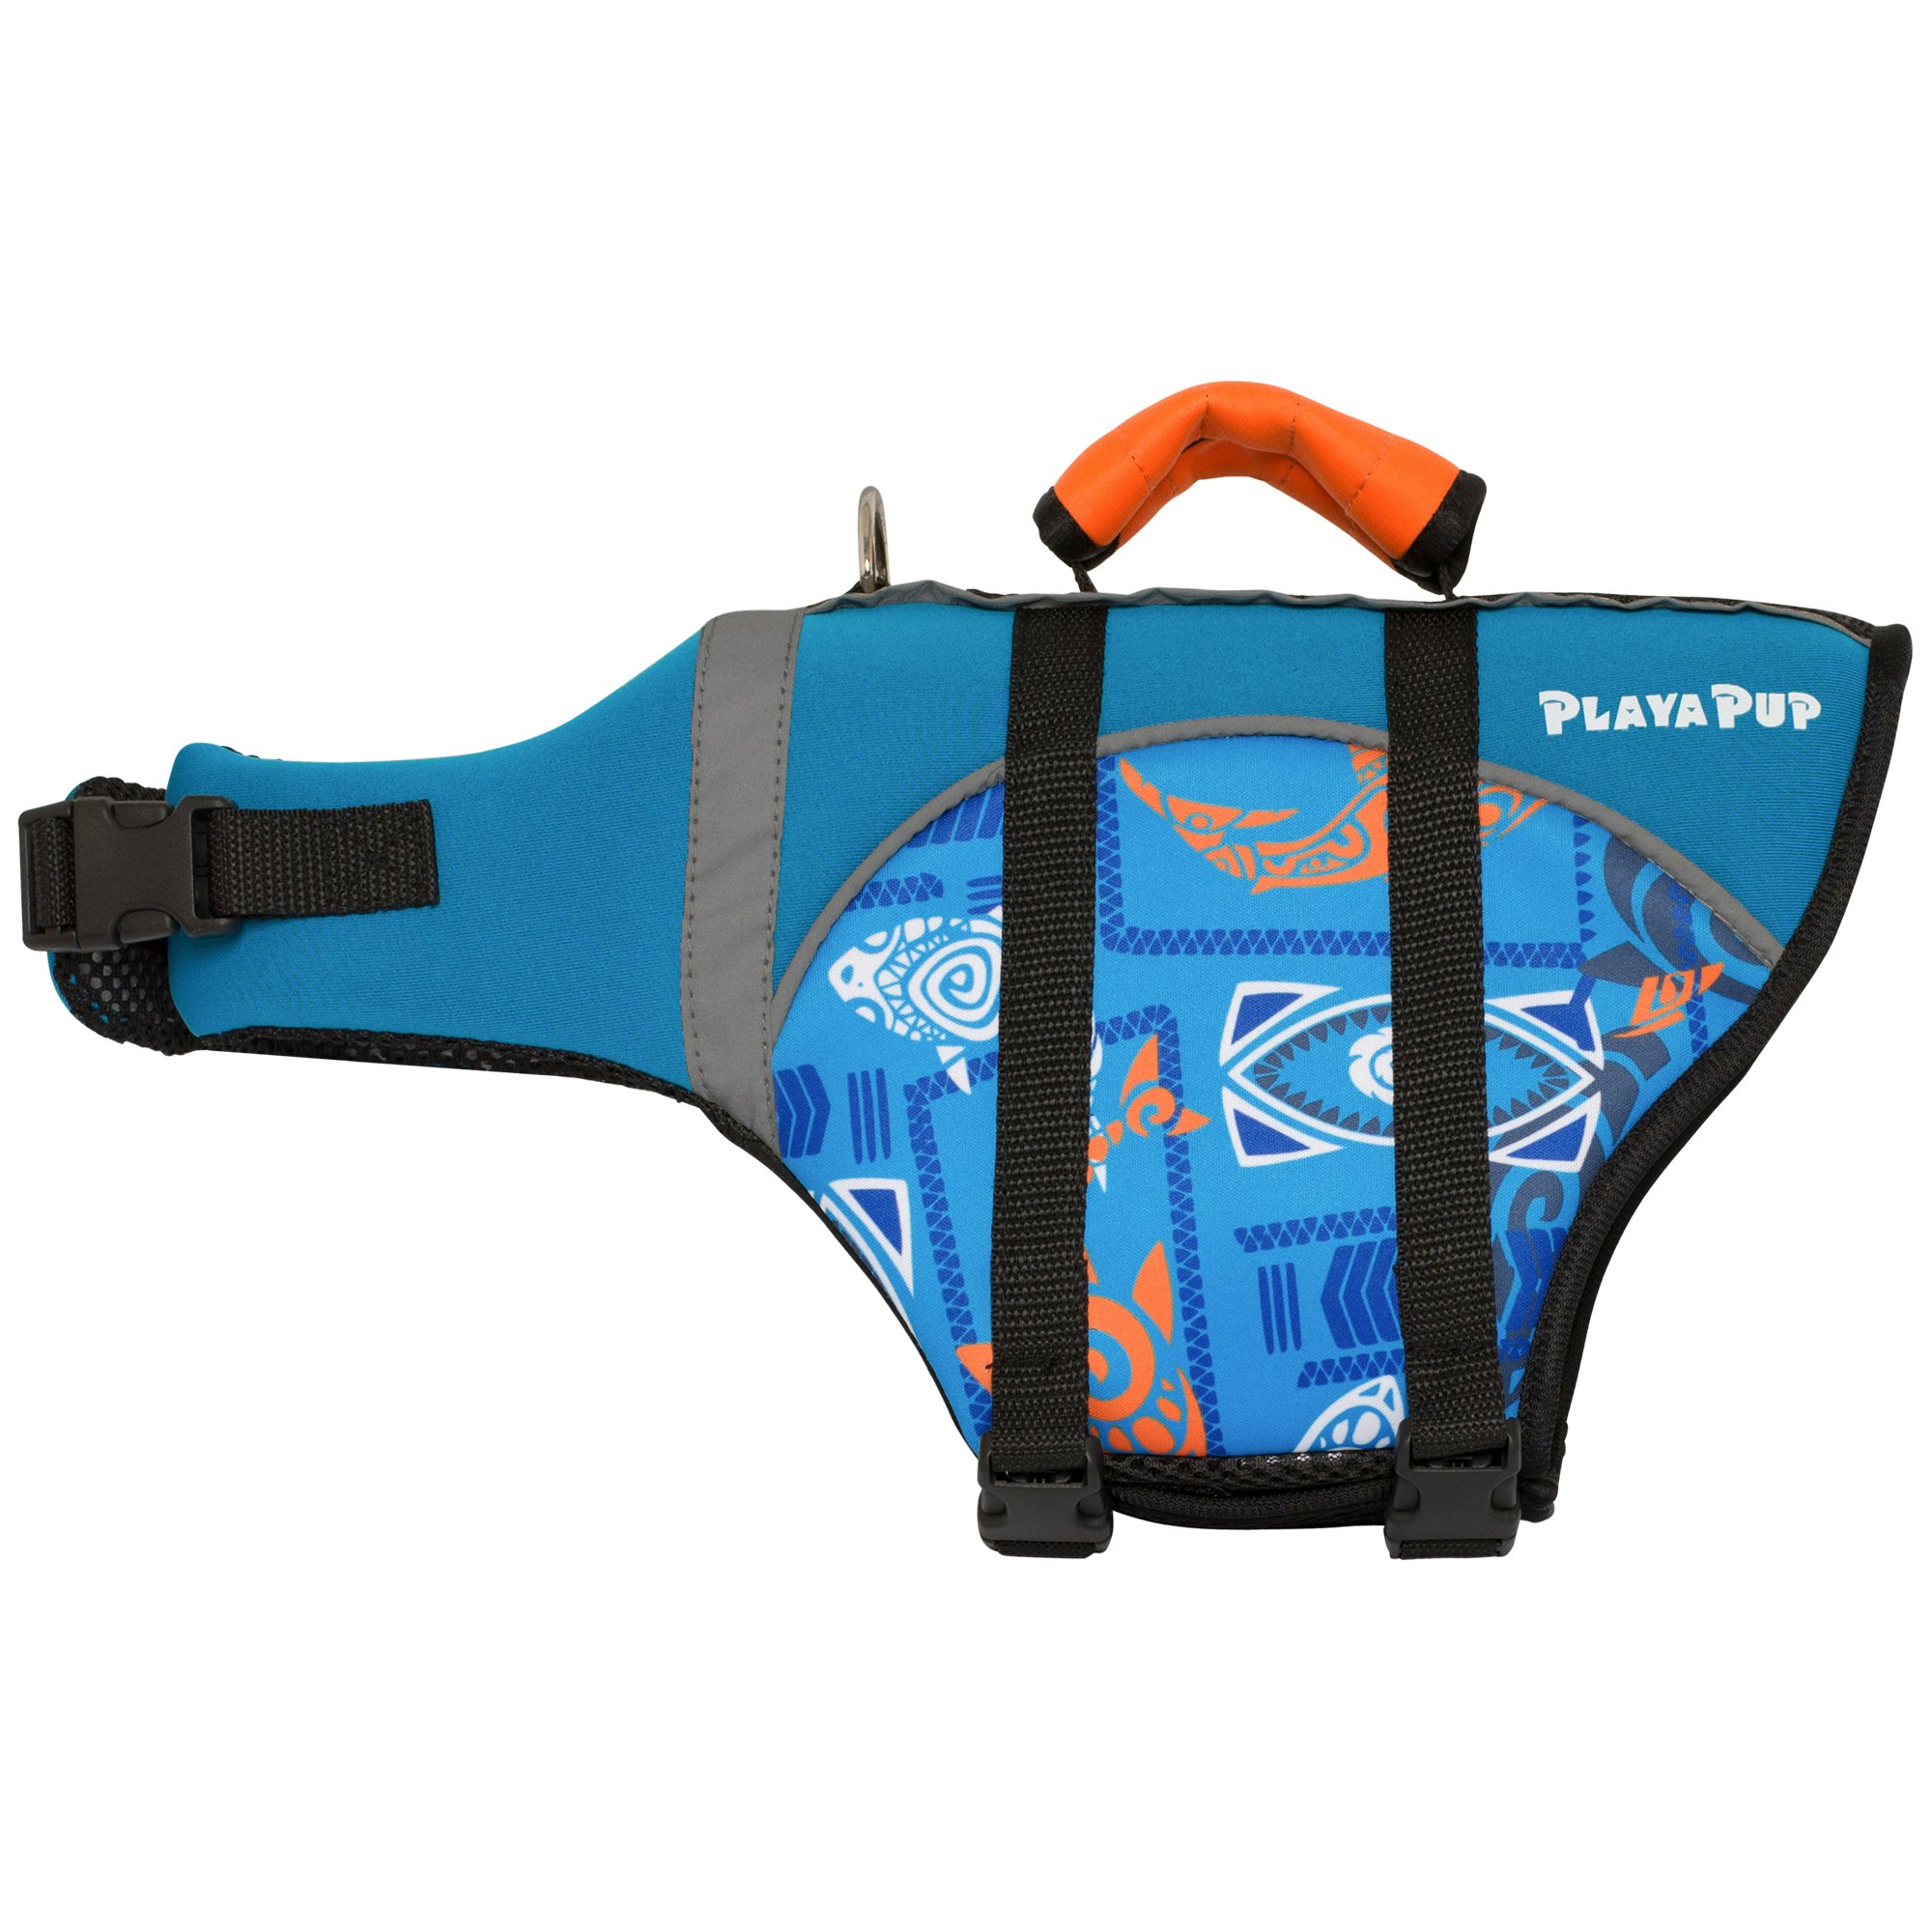 Image of Playa Pup Pet Flotation Vest Blue Shark, Medium, Blue / Orange